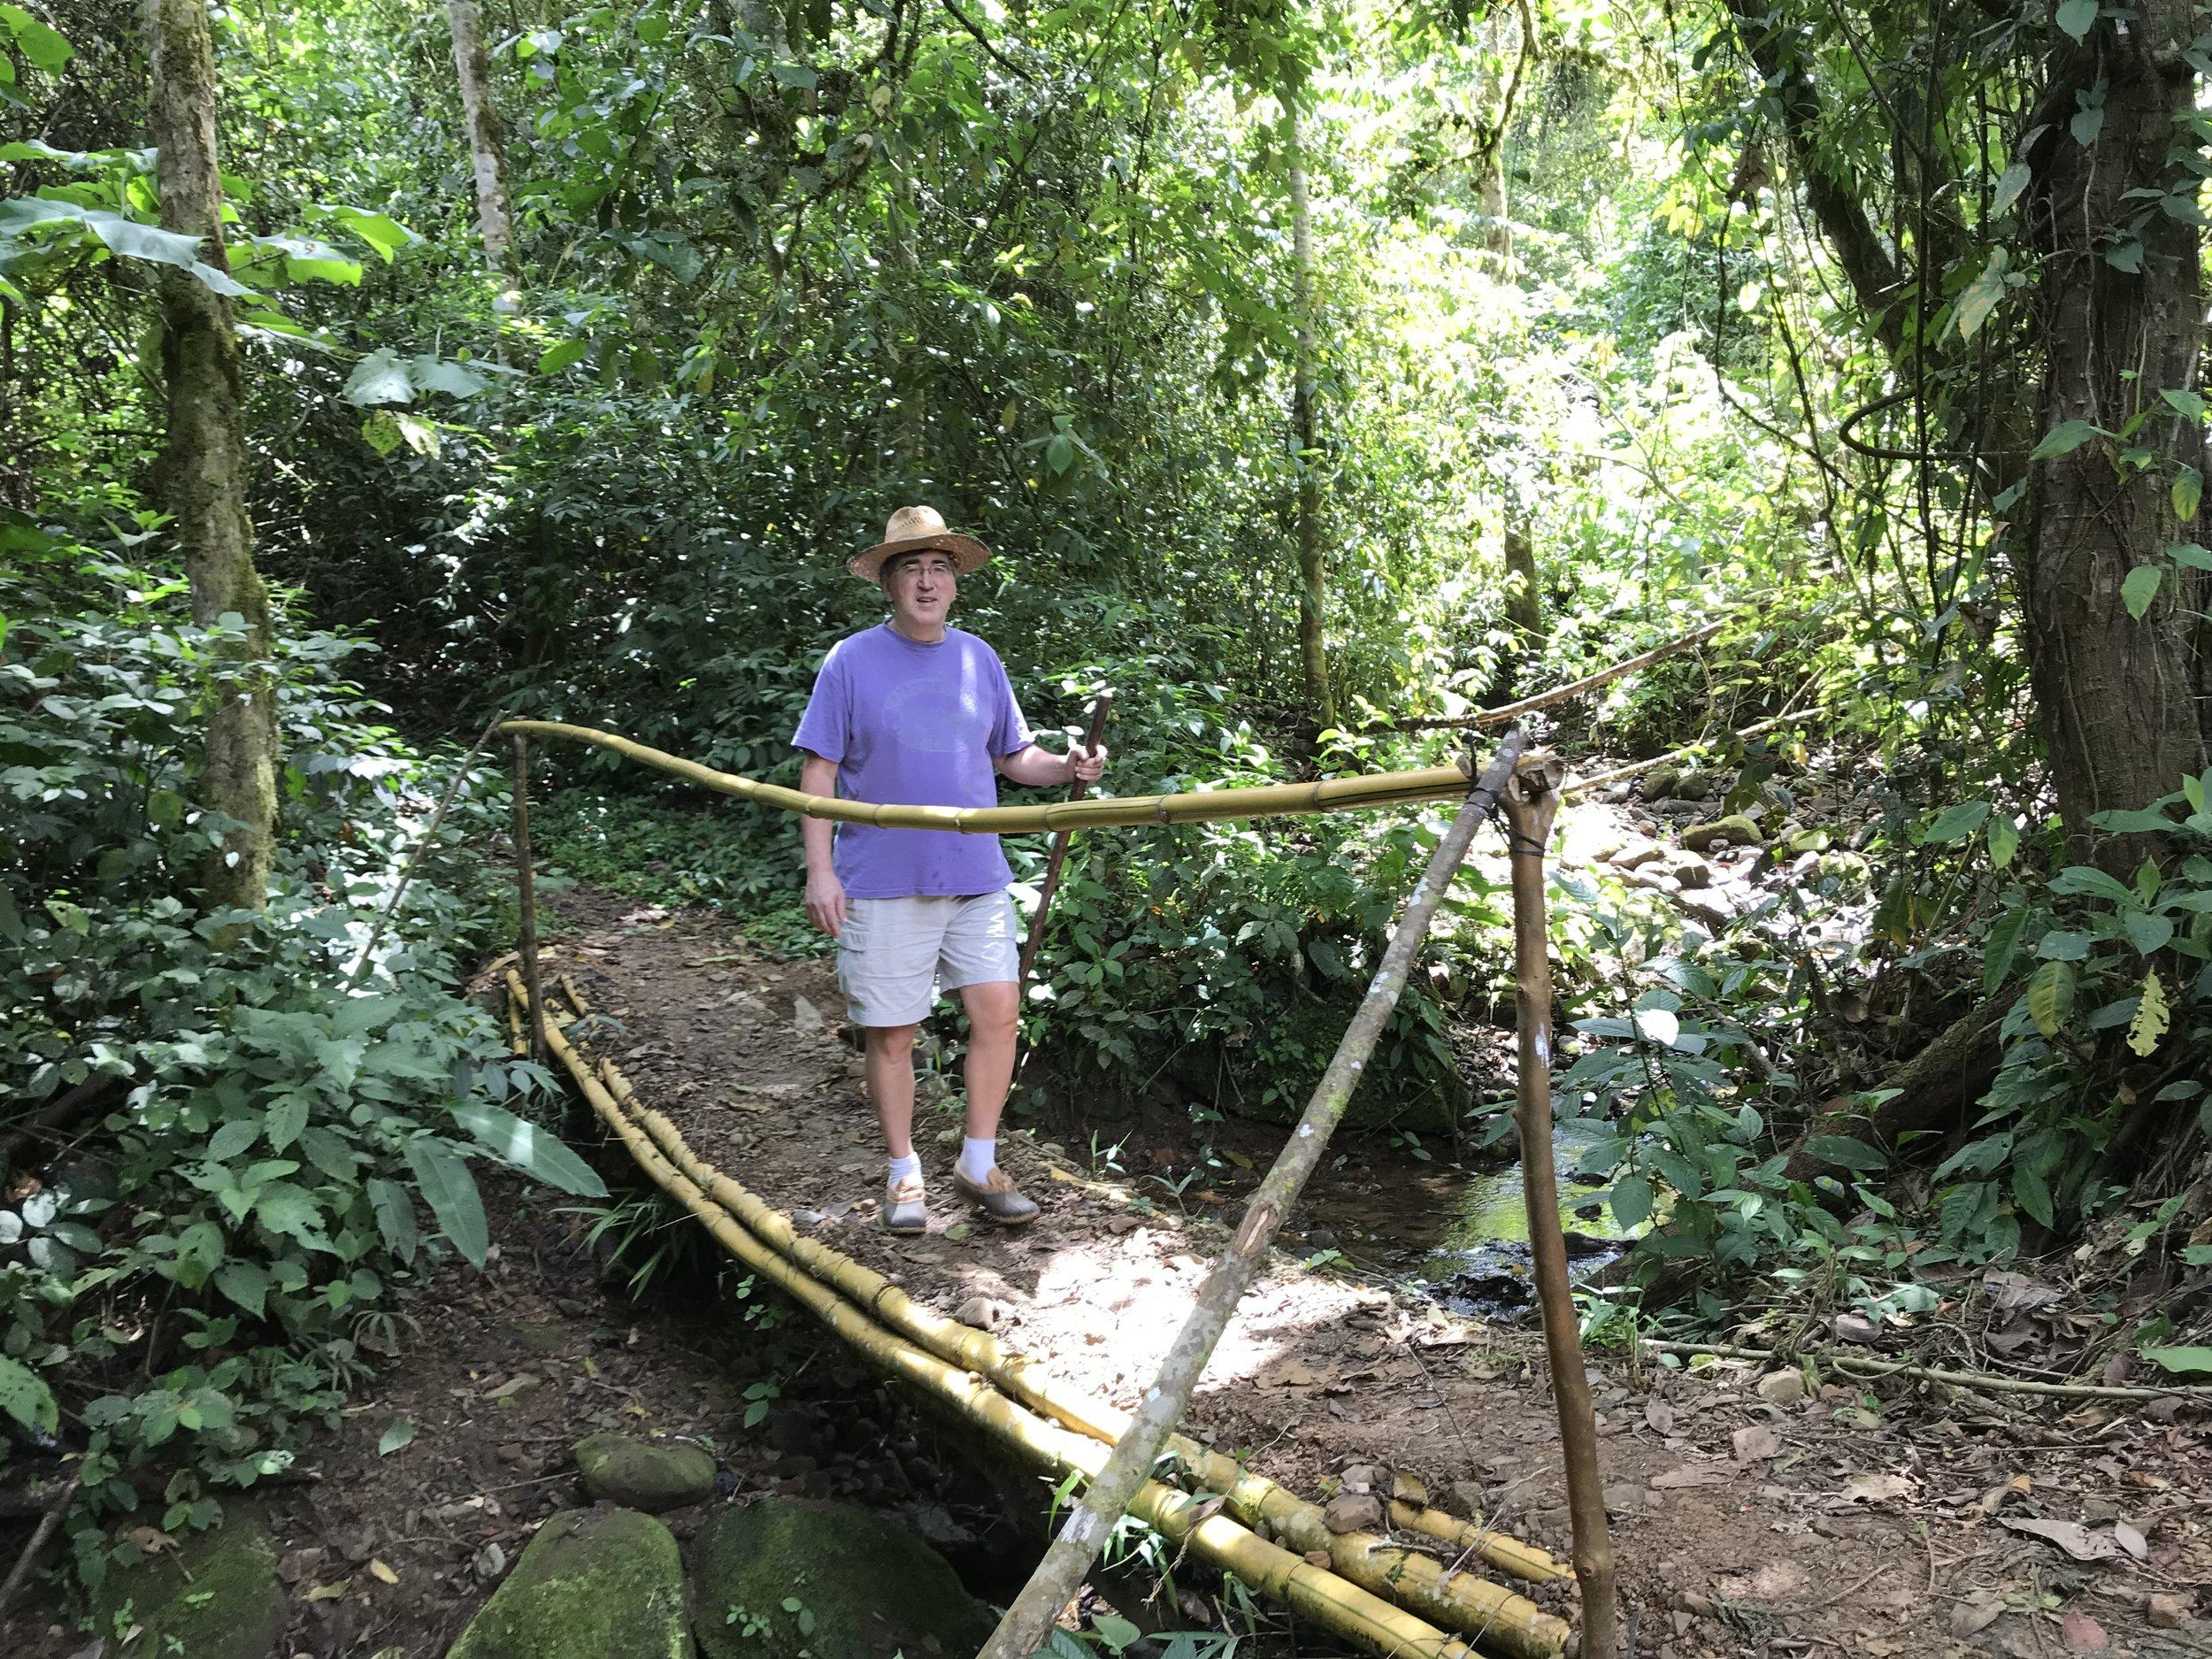 CROSSING THE BAMBOO BRIDGE